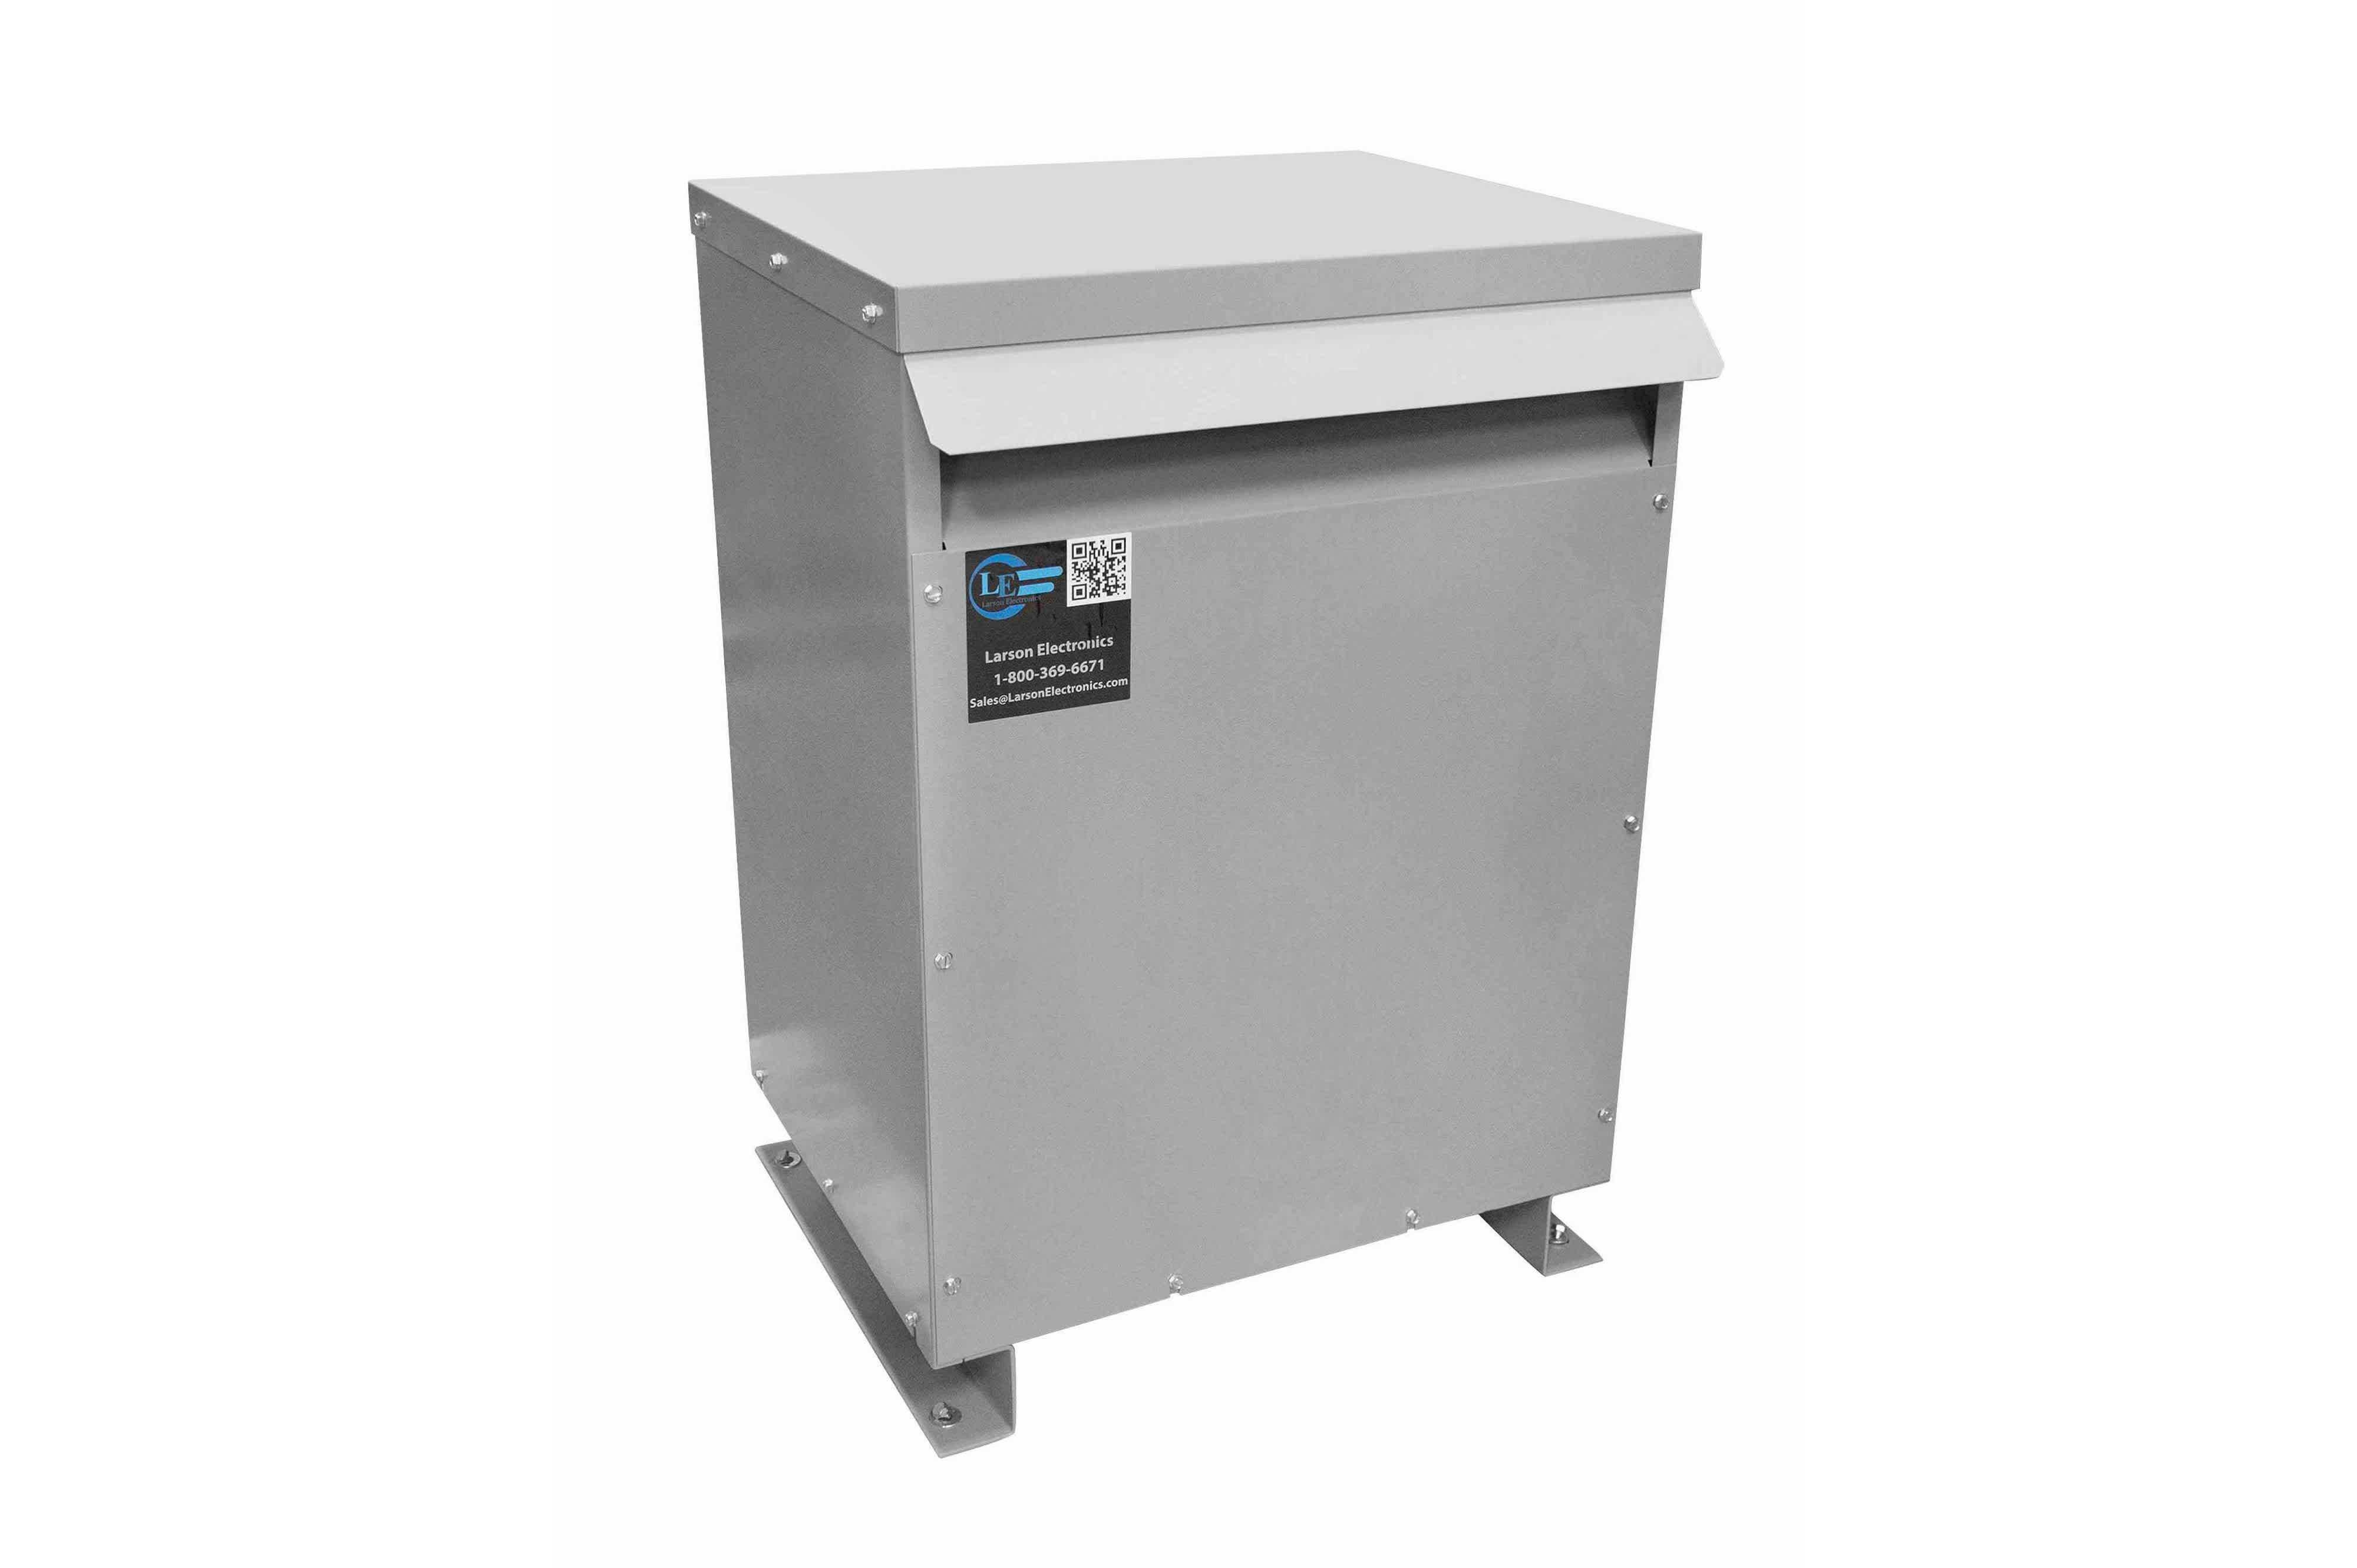 36 kVA 3PH Isolation Transformer, 575V Wye Primary, 240V Delta Secondary, N3R, Ventilated, 60 Hz